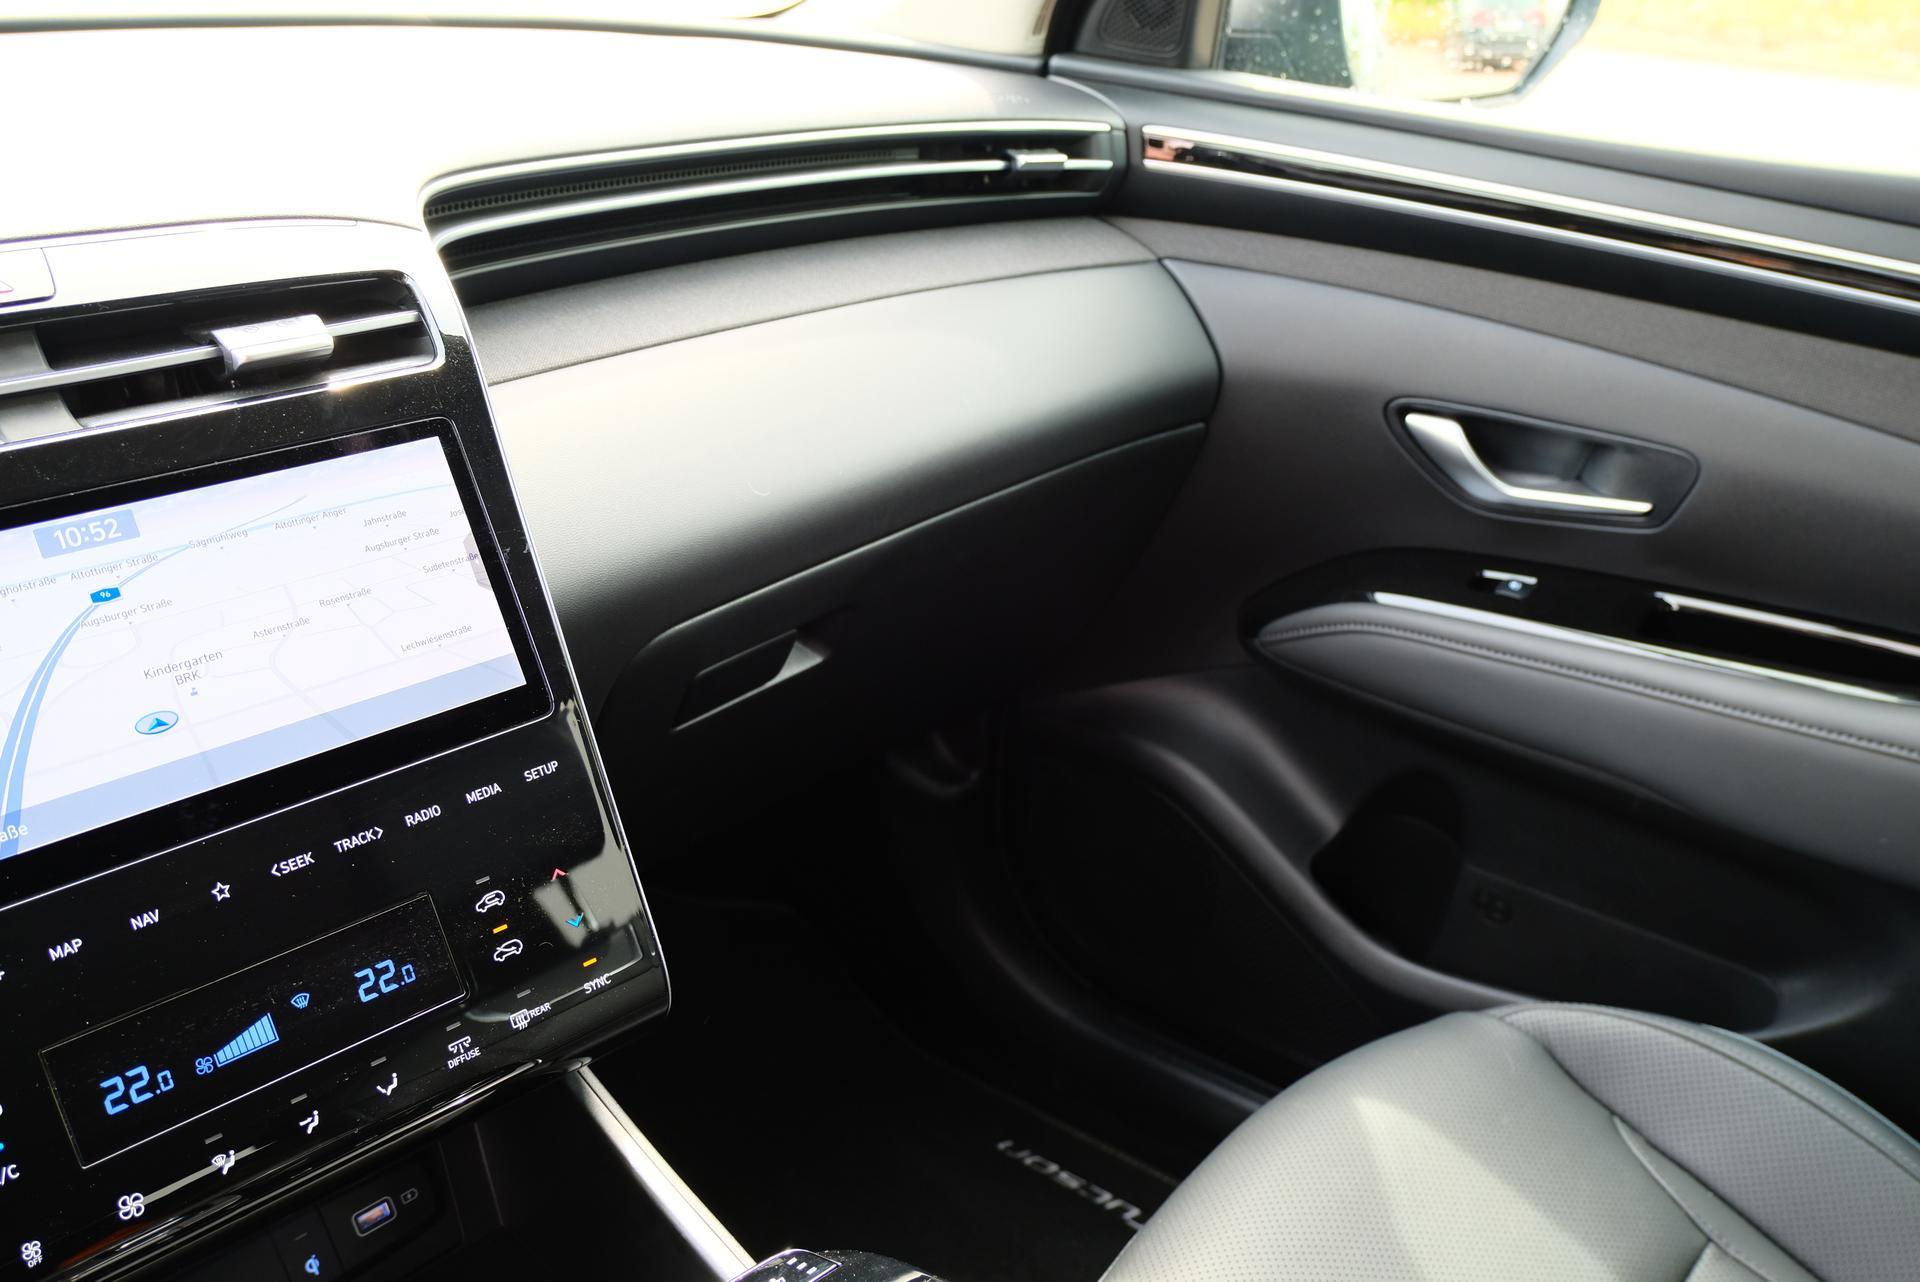 Hyundai Tucson 1.6 T-GDI HEV 4x4 Innenraum